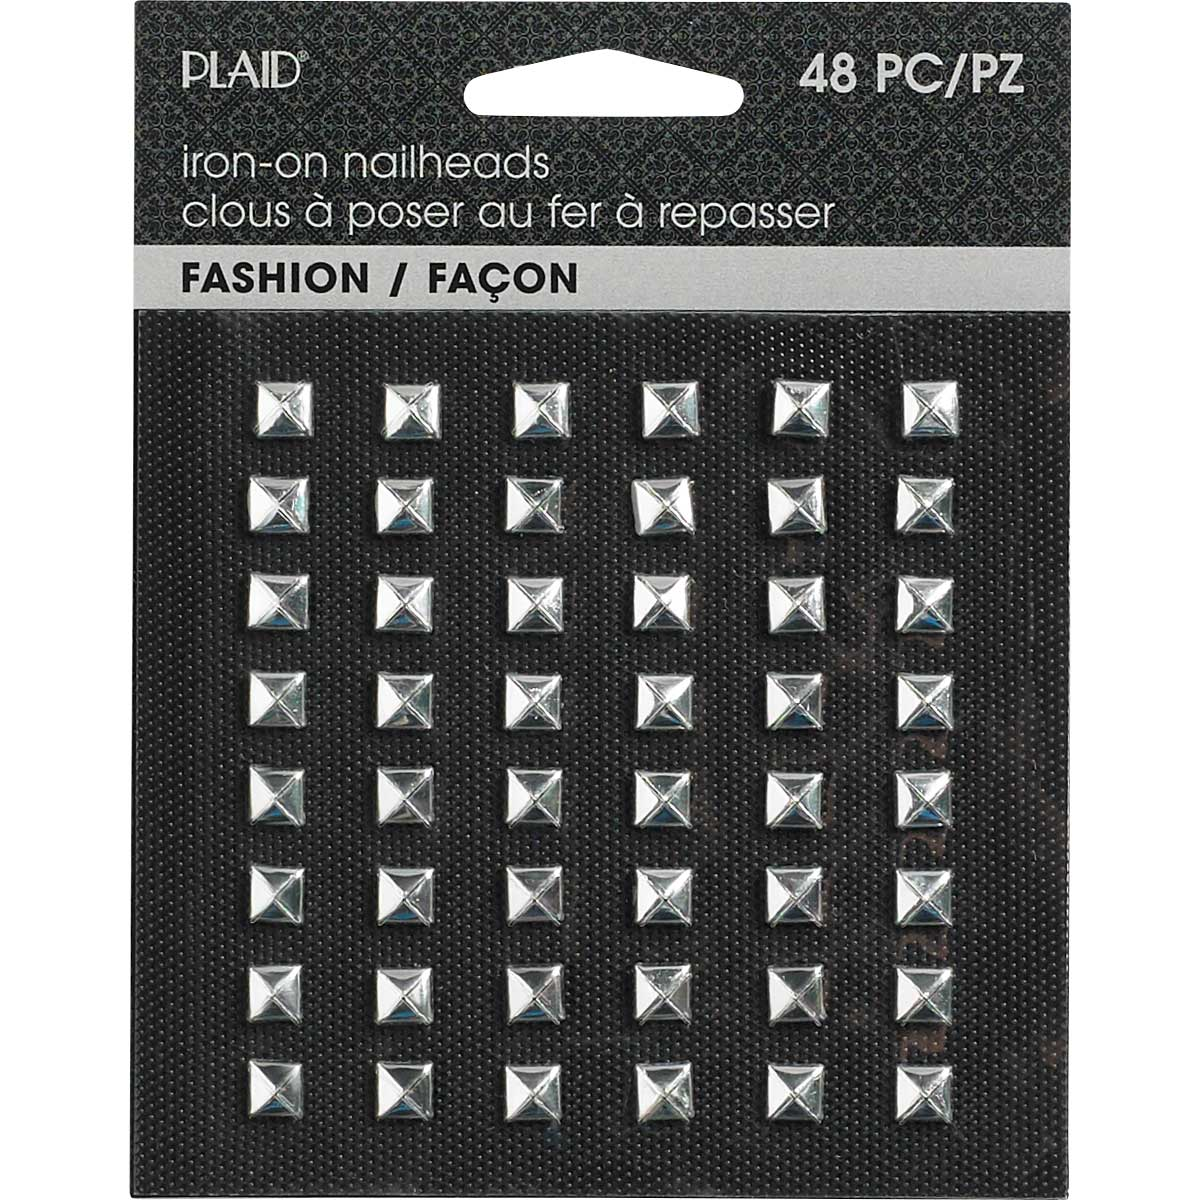 Plaid ® Hot Fix Nailhead Iron-Ons - Pyramid Shiny Silver